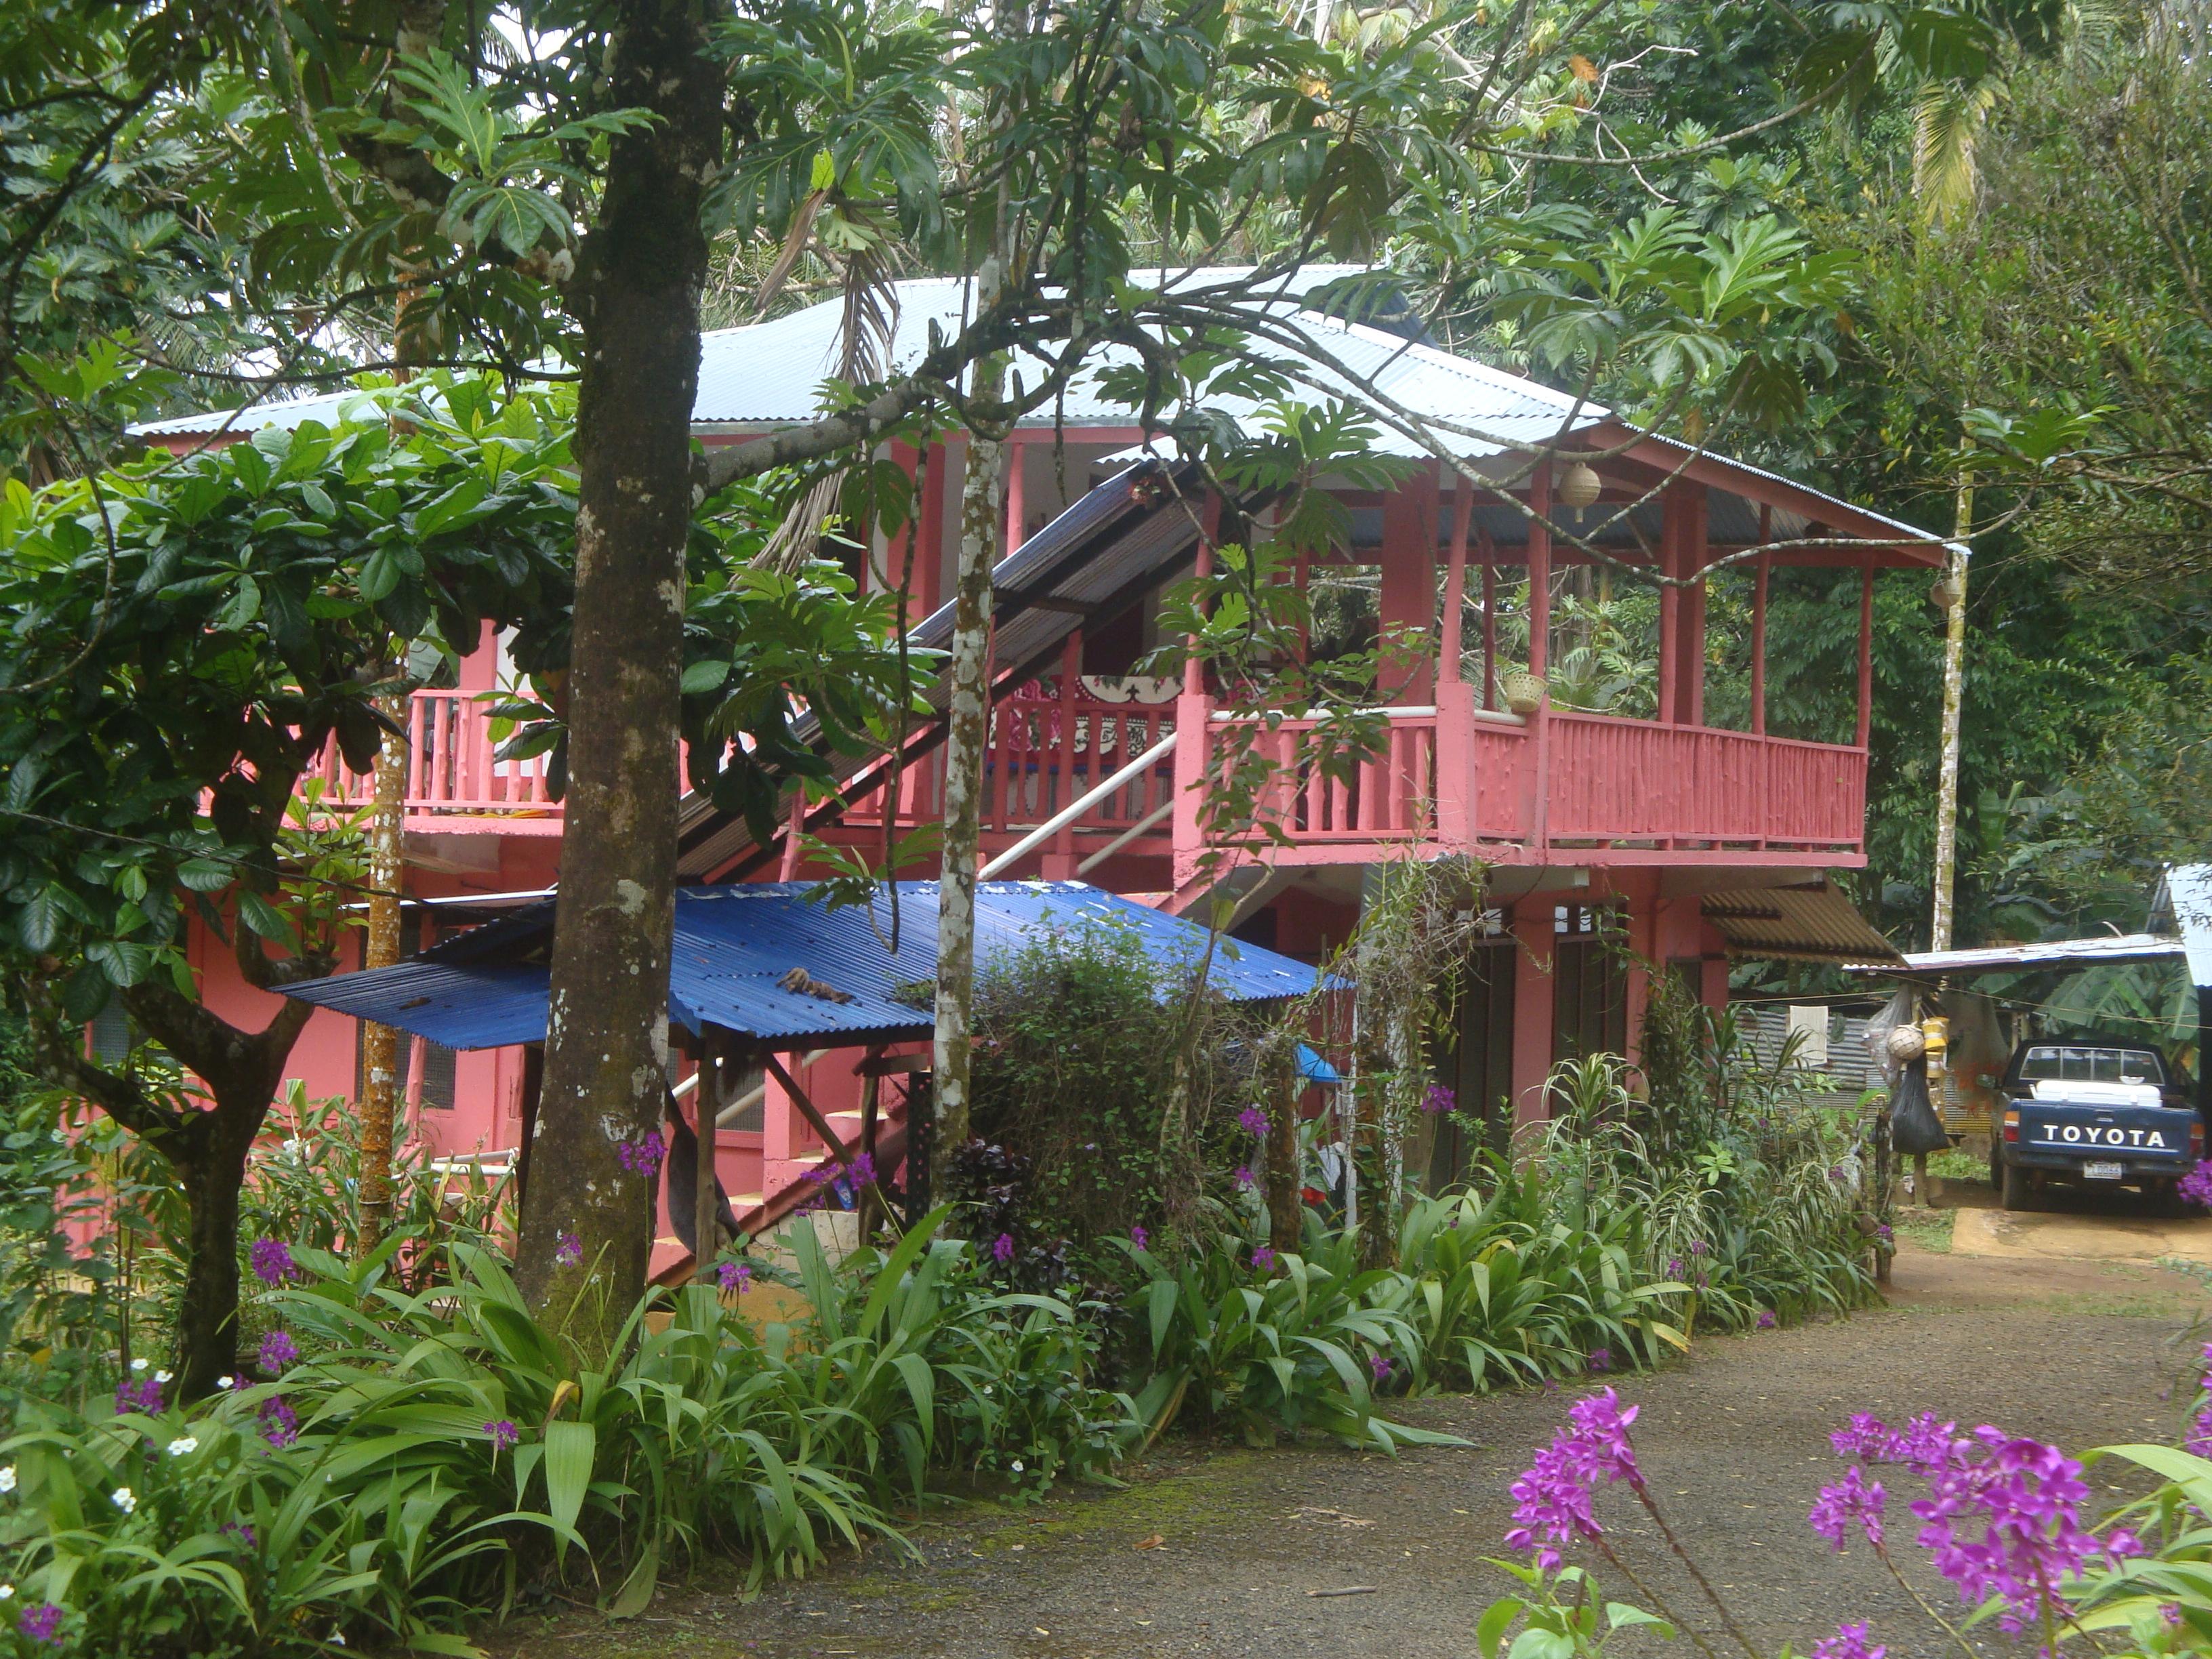 Pimp My Treehouse Houses Of Pohnpei Vagabond3 World